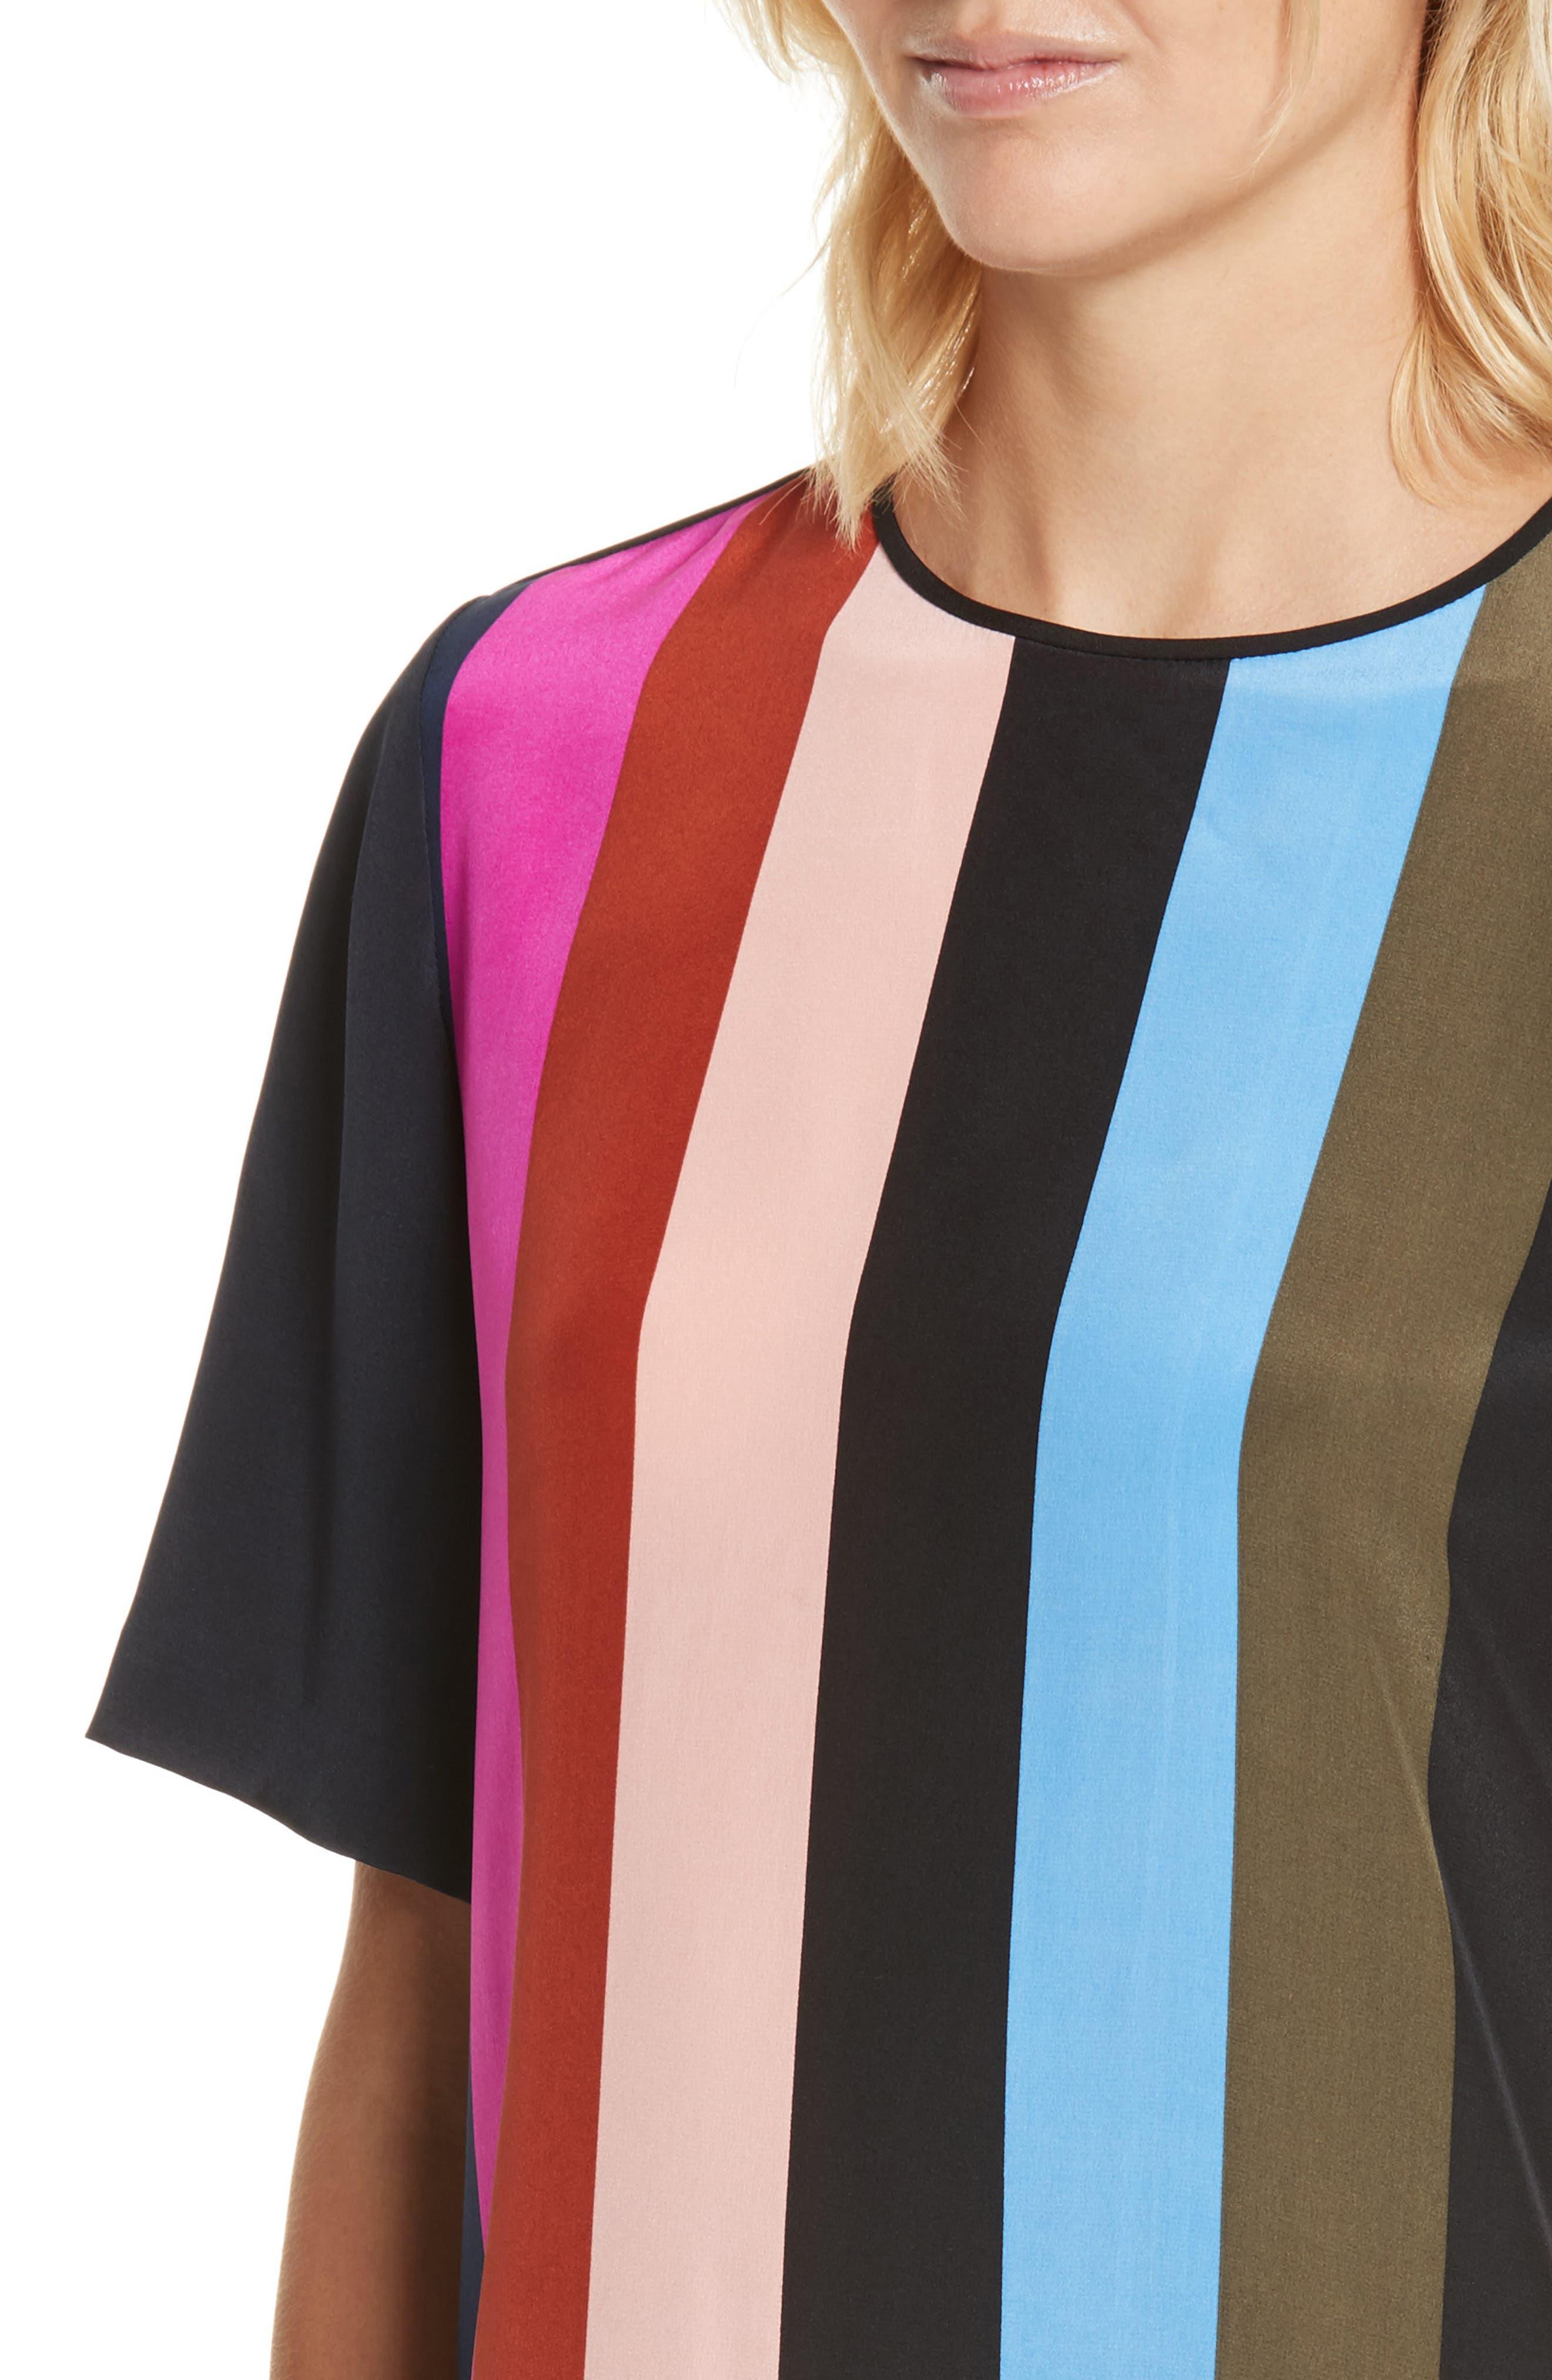 Diane von Furstenberg Stripe Silk Shift Dress,                             Alternate thumbnail 4, color,                             005